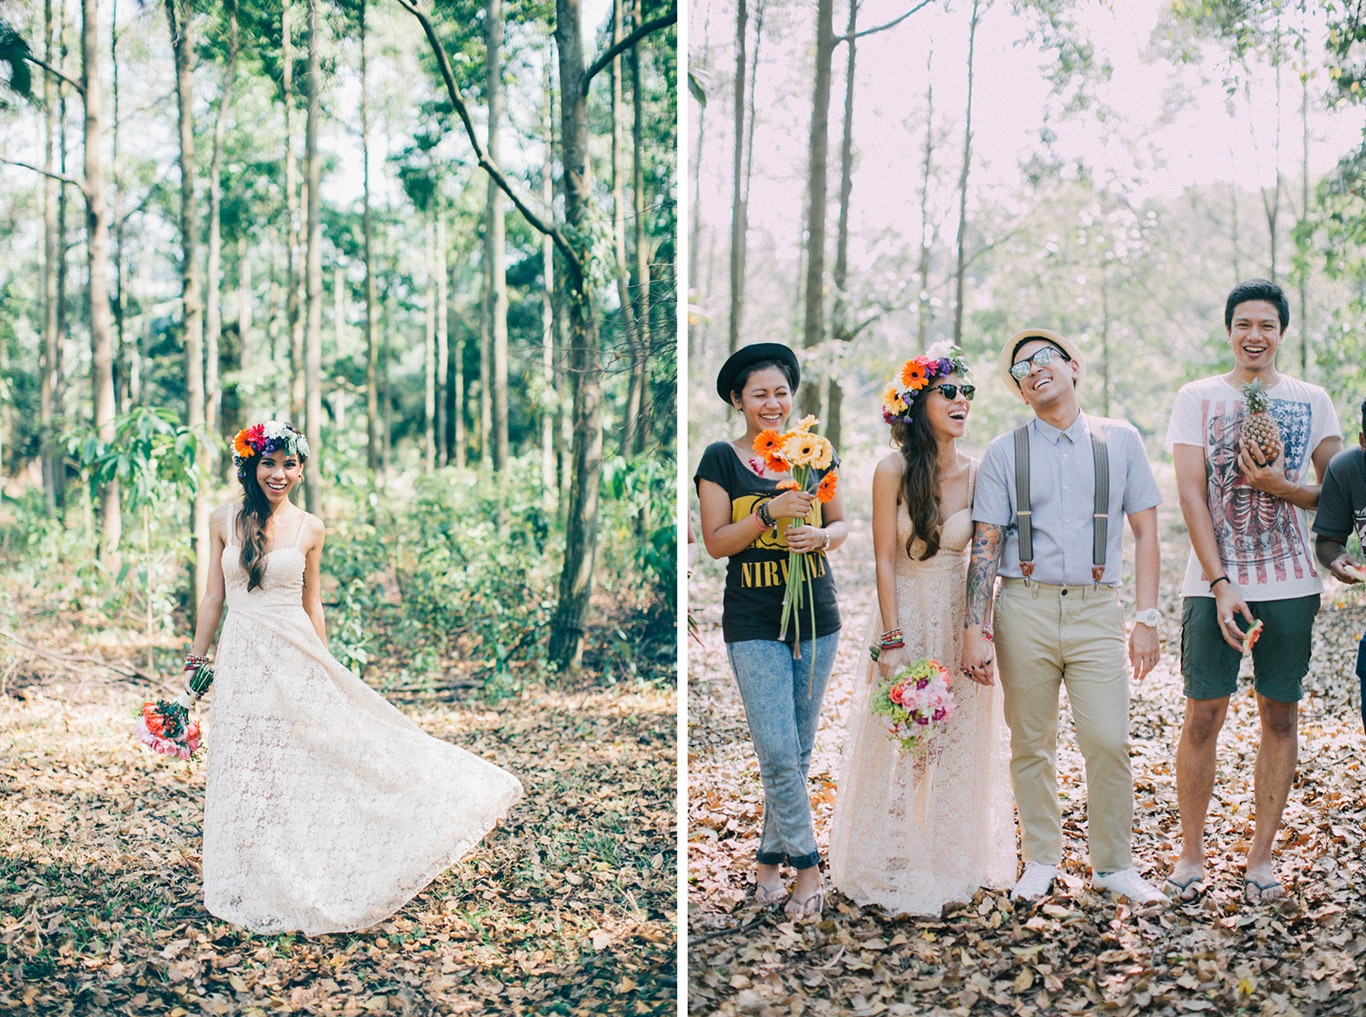 35-hellojanelee-boho-prewedding-malaysia